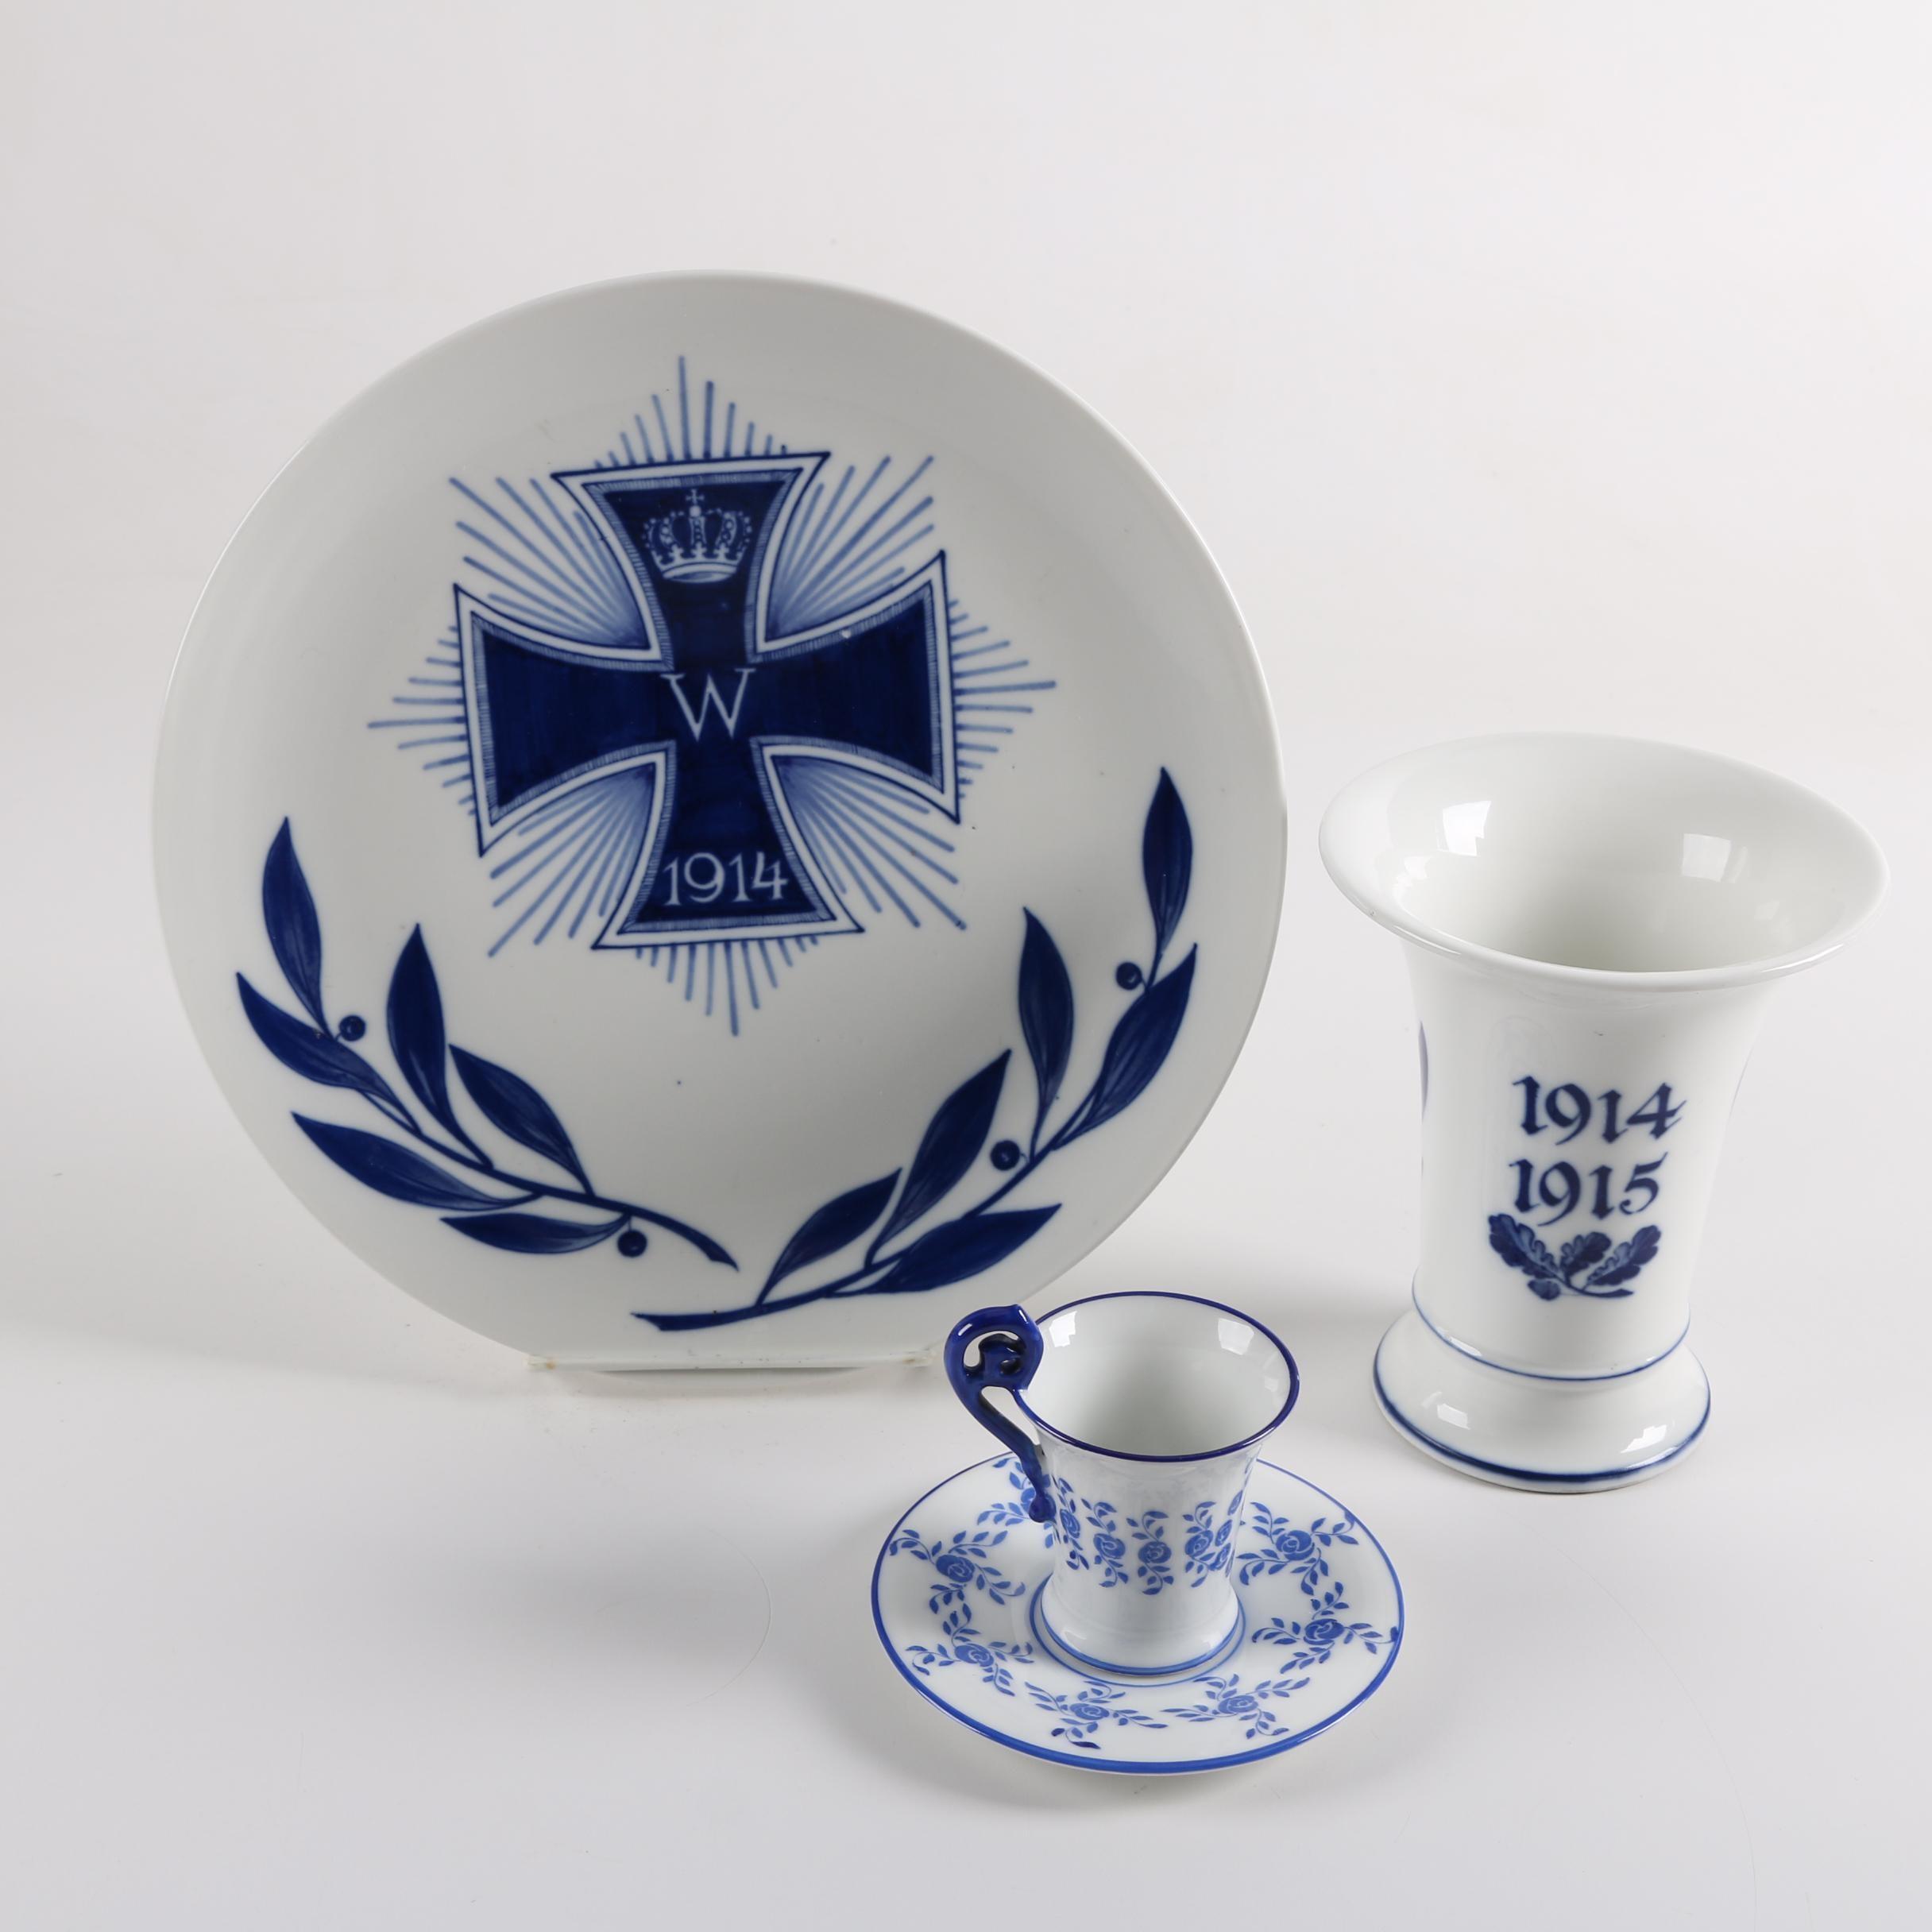 Antique German Porcelain Tableware Including Meissen